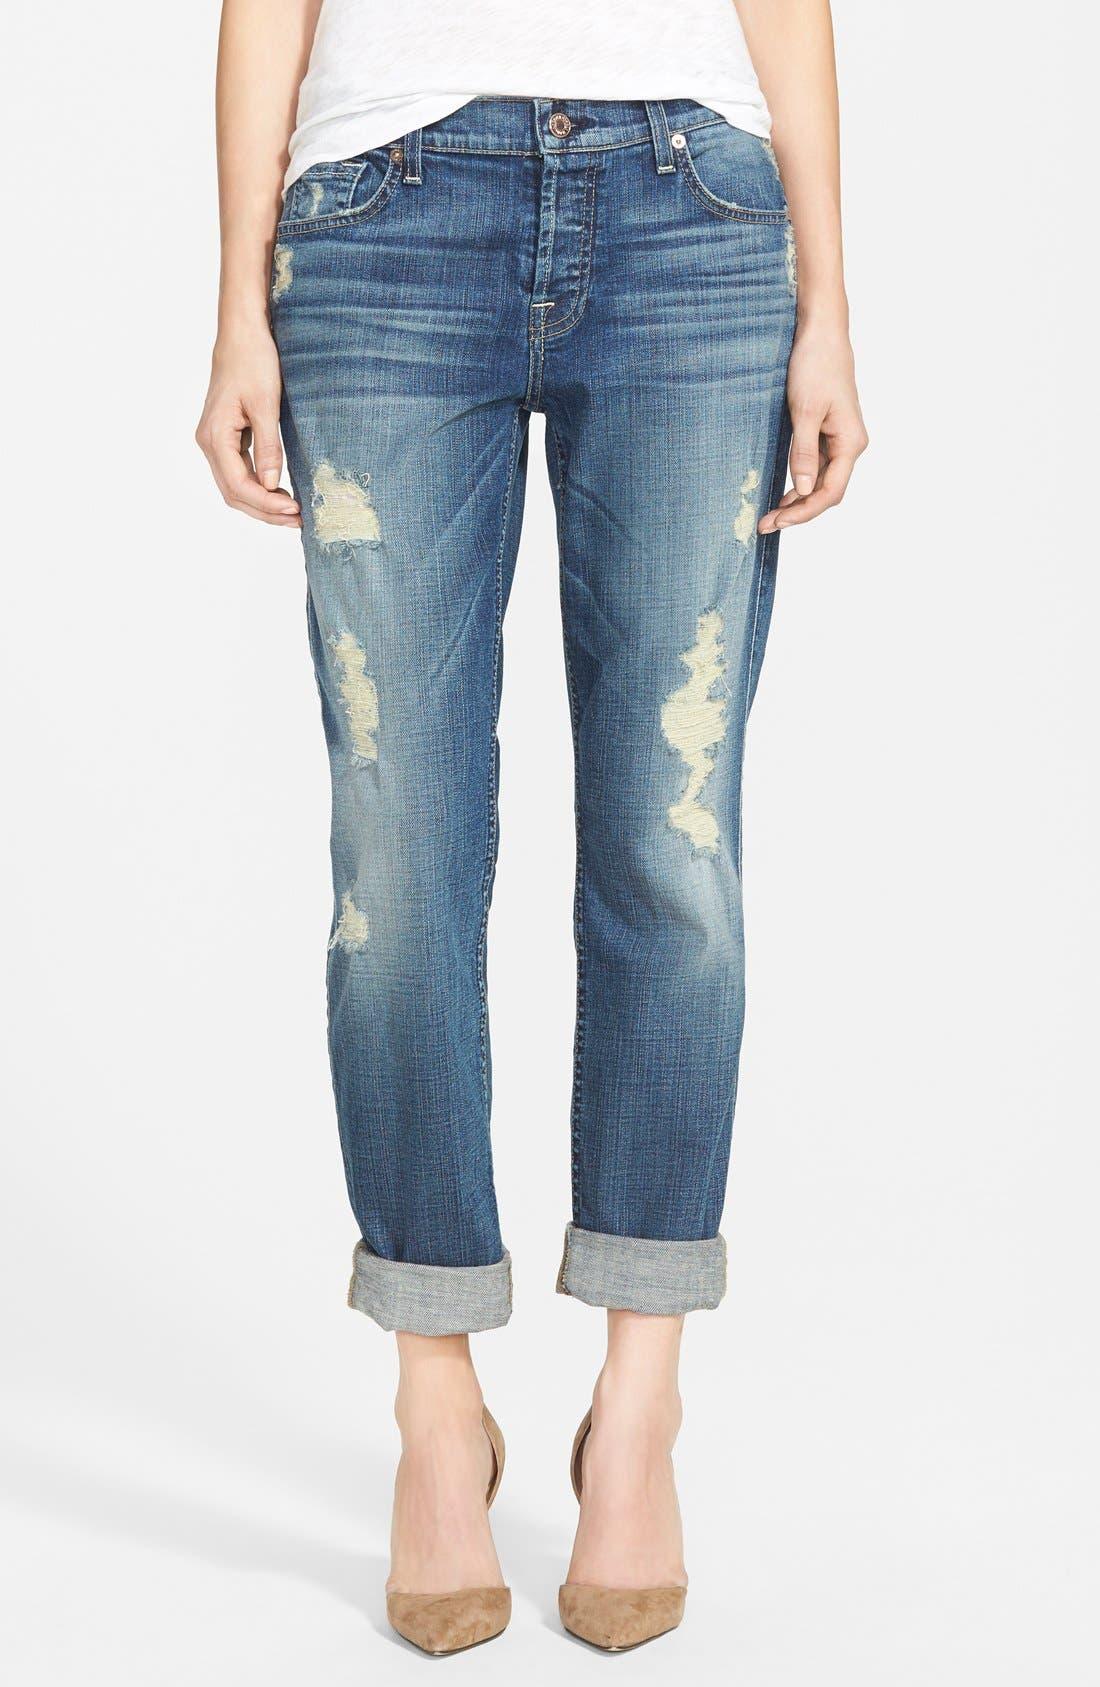 Main Image - 7 For All Mankind® 'Josefina' Boyfriend Jeans (Dusty Vintage Blue)